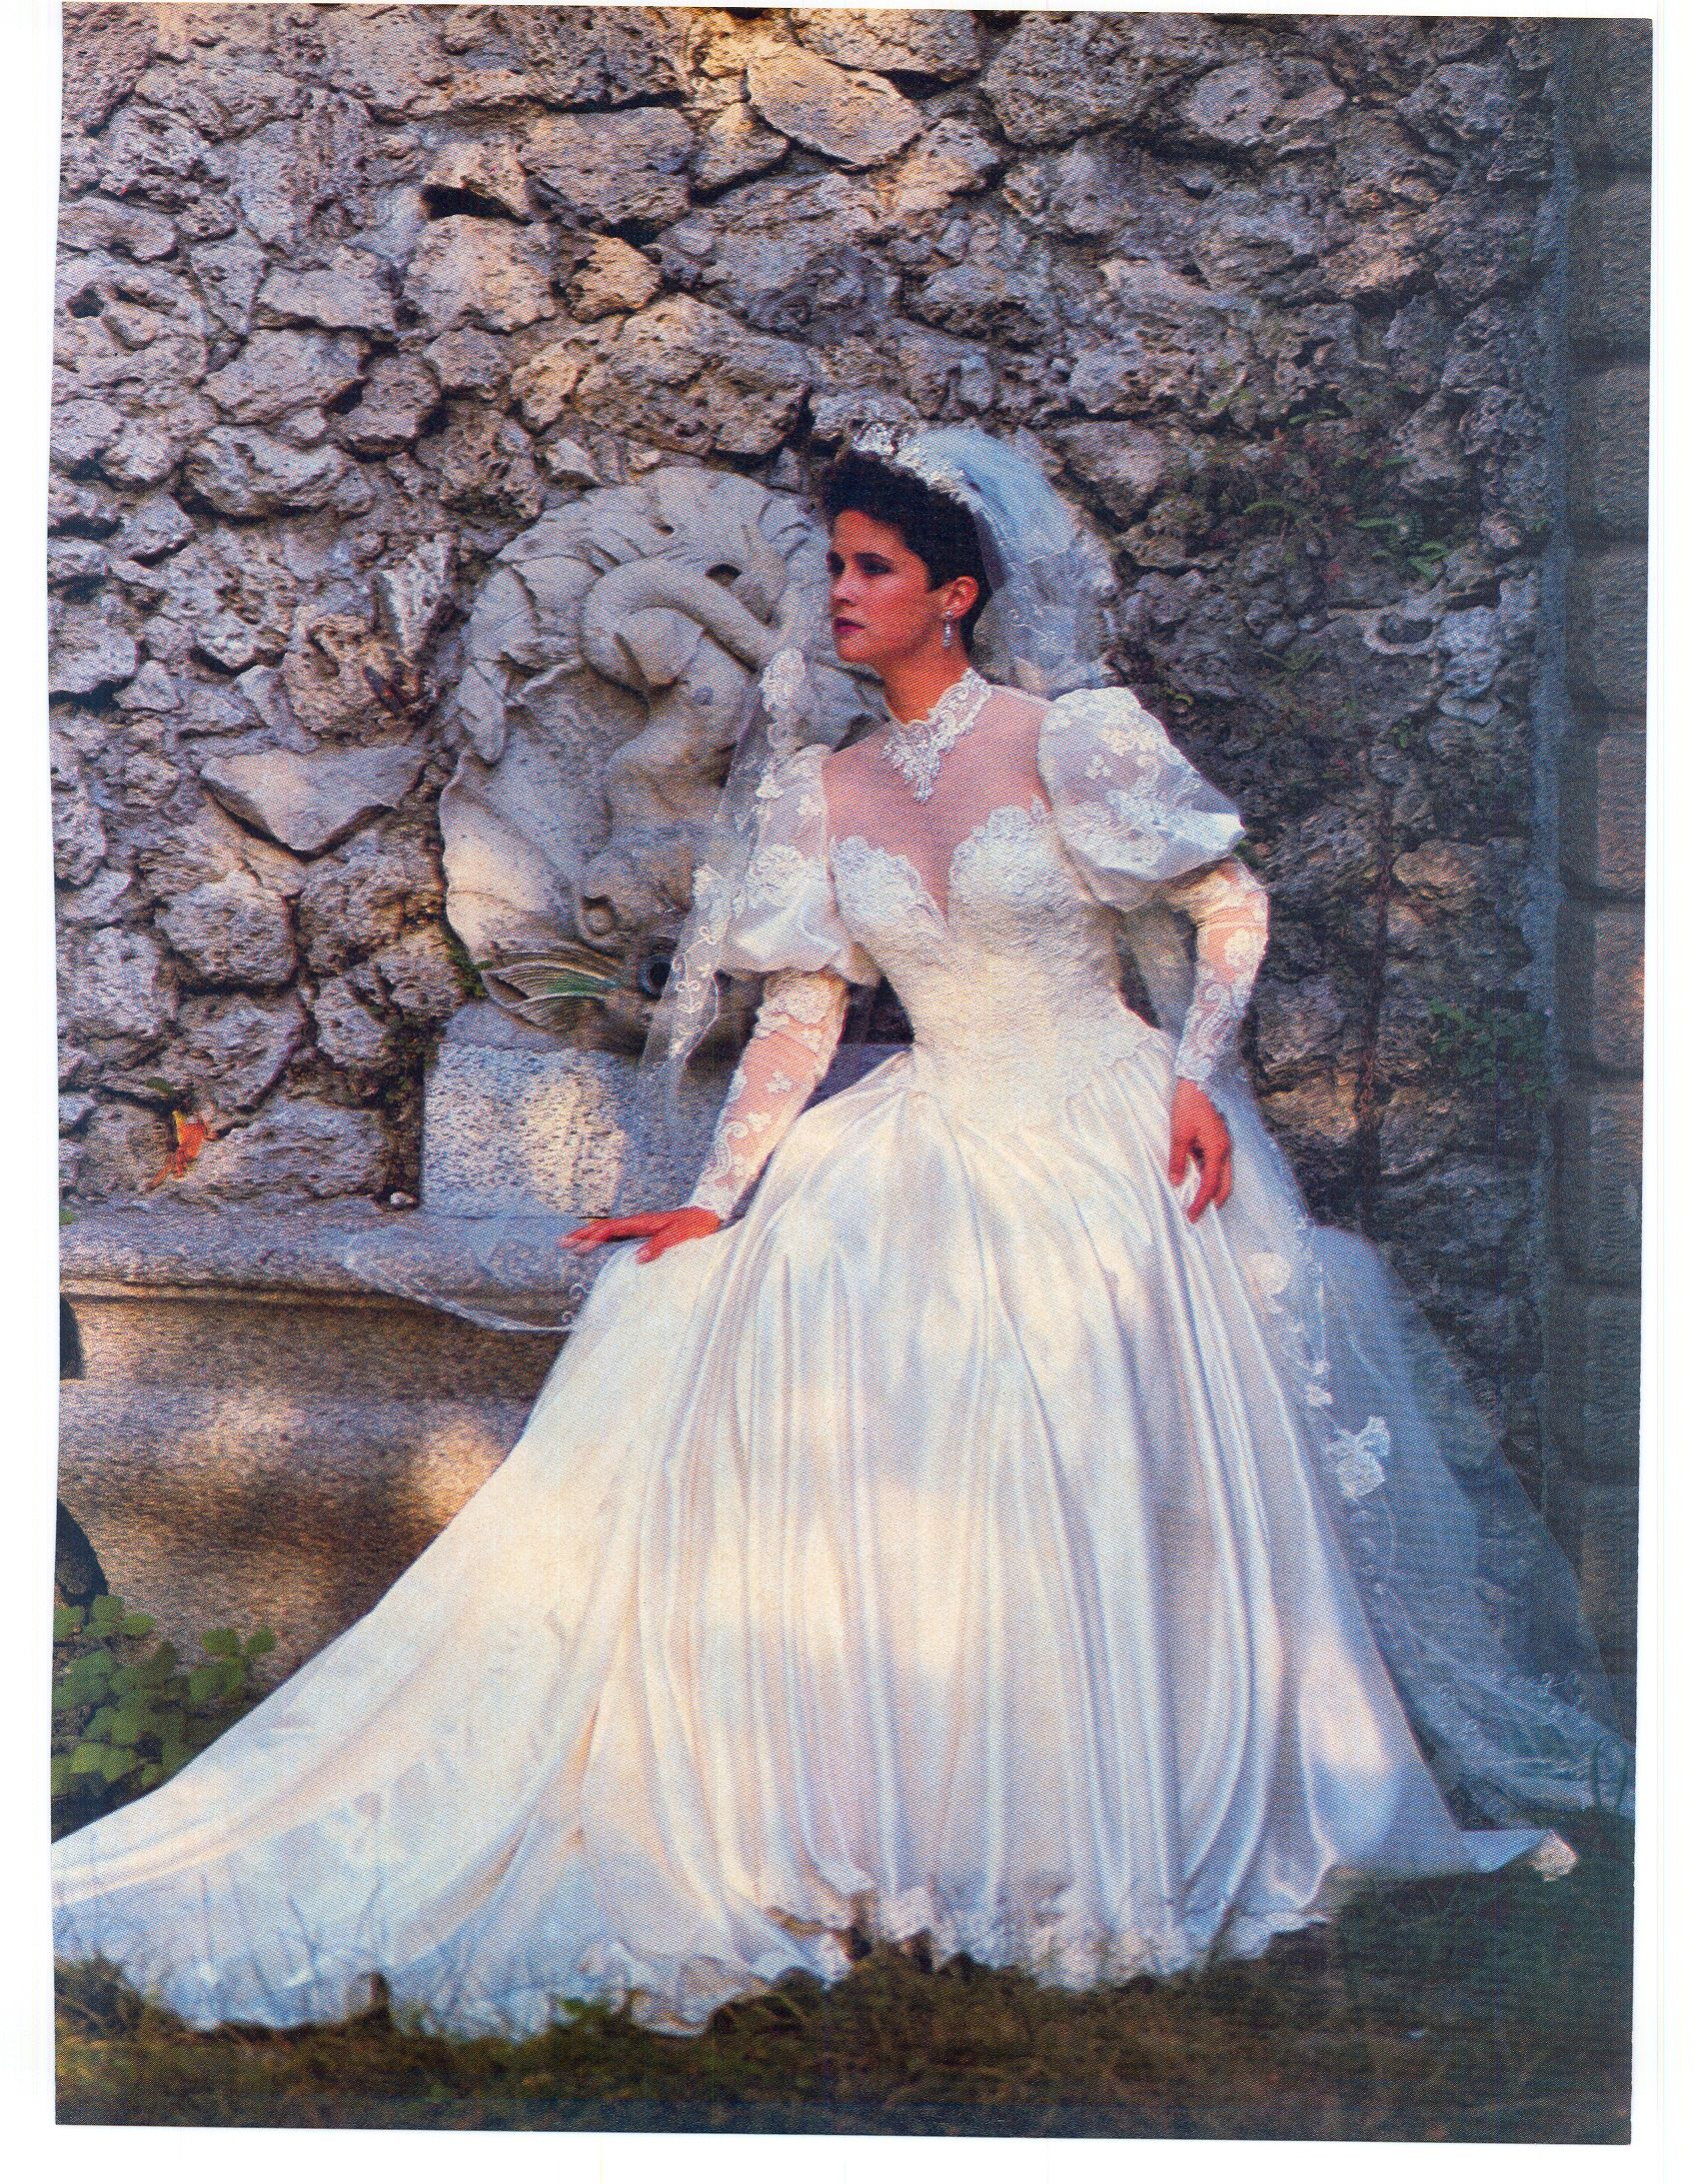 1985 April May Brides Magazine 1980s Wedding Dress Gorgeous